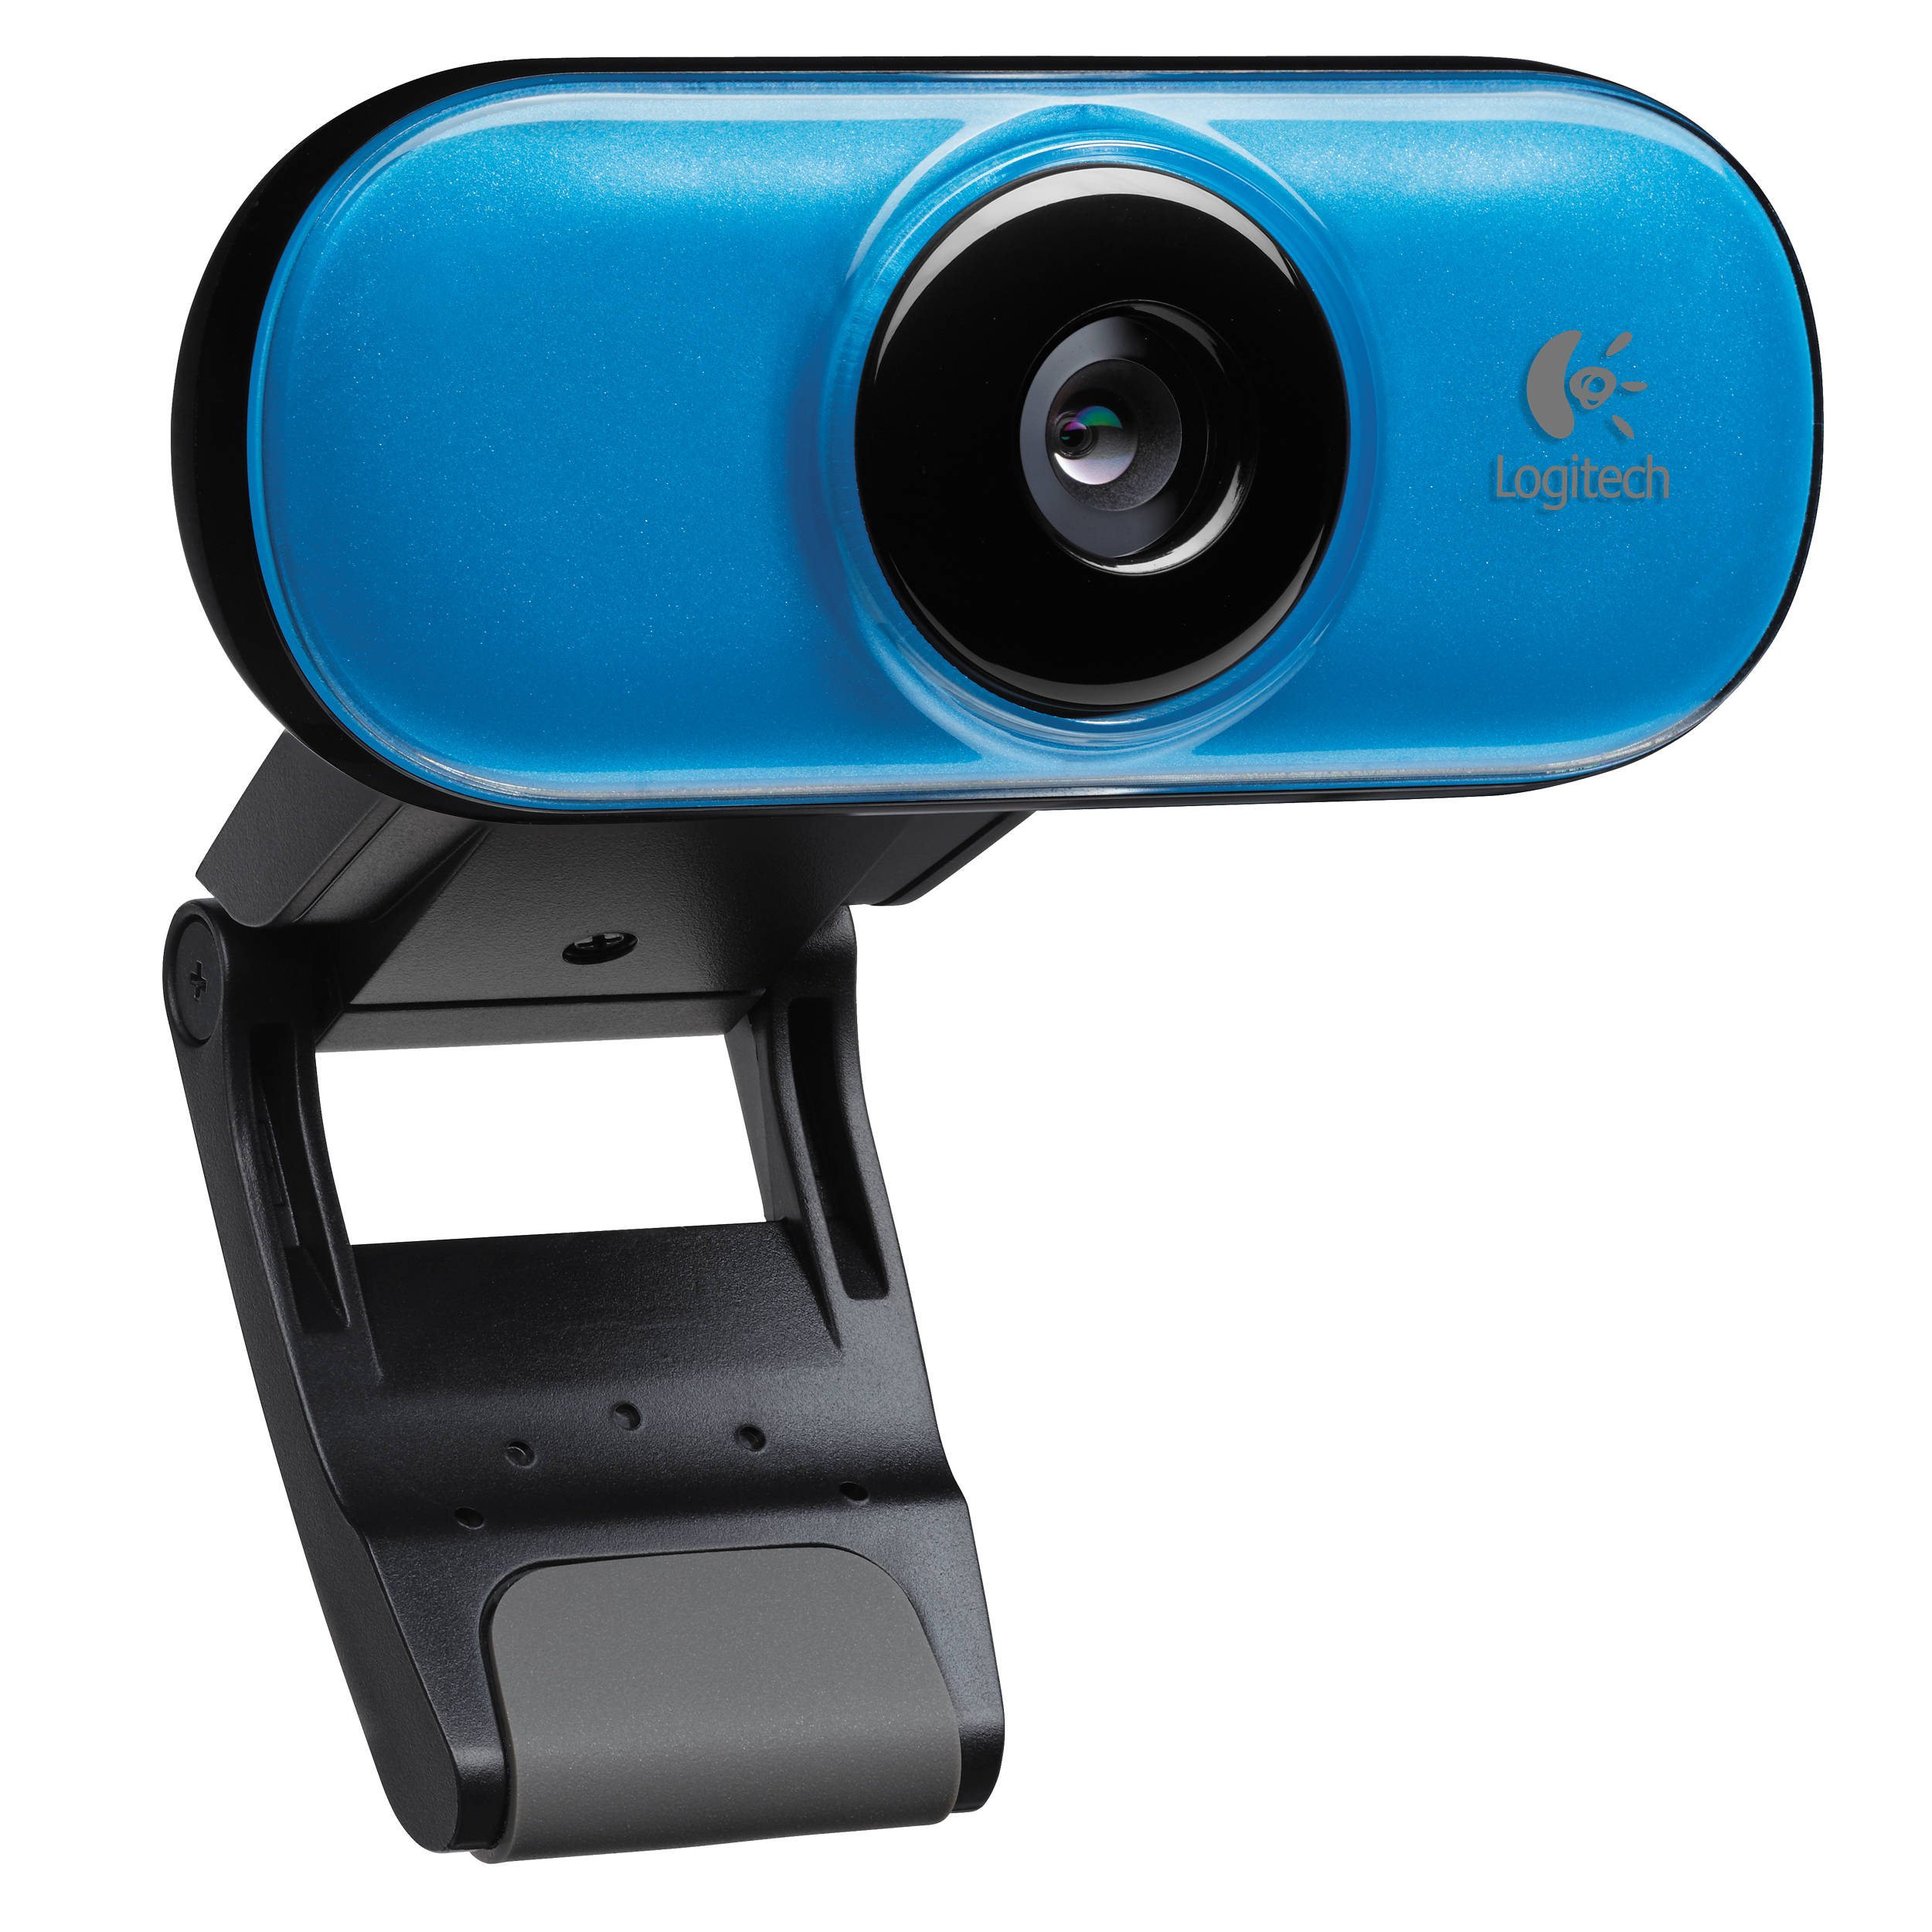 Usb 500m 6 led webcam camera web cam with mic for desktop pc laptop